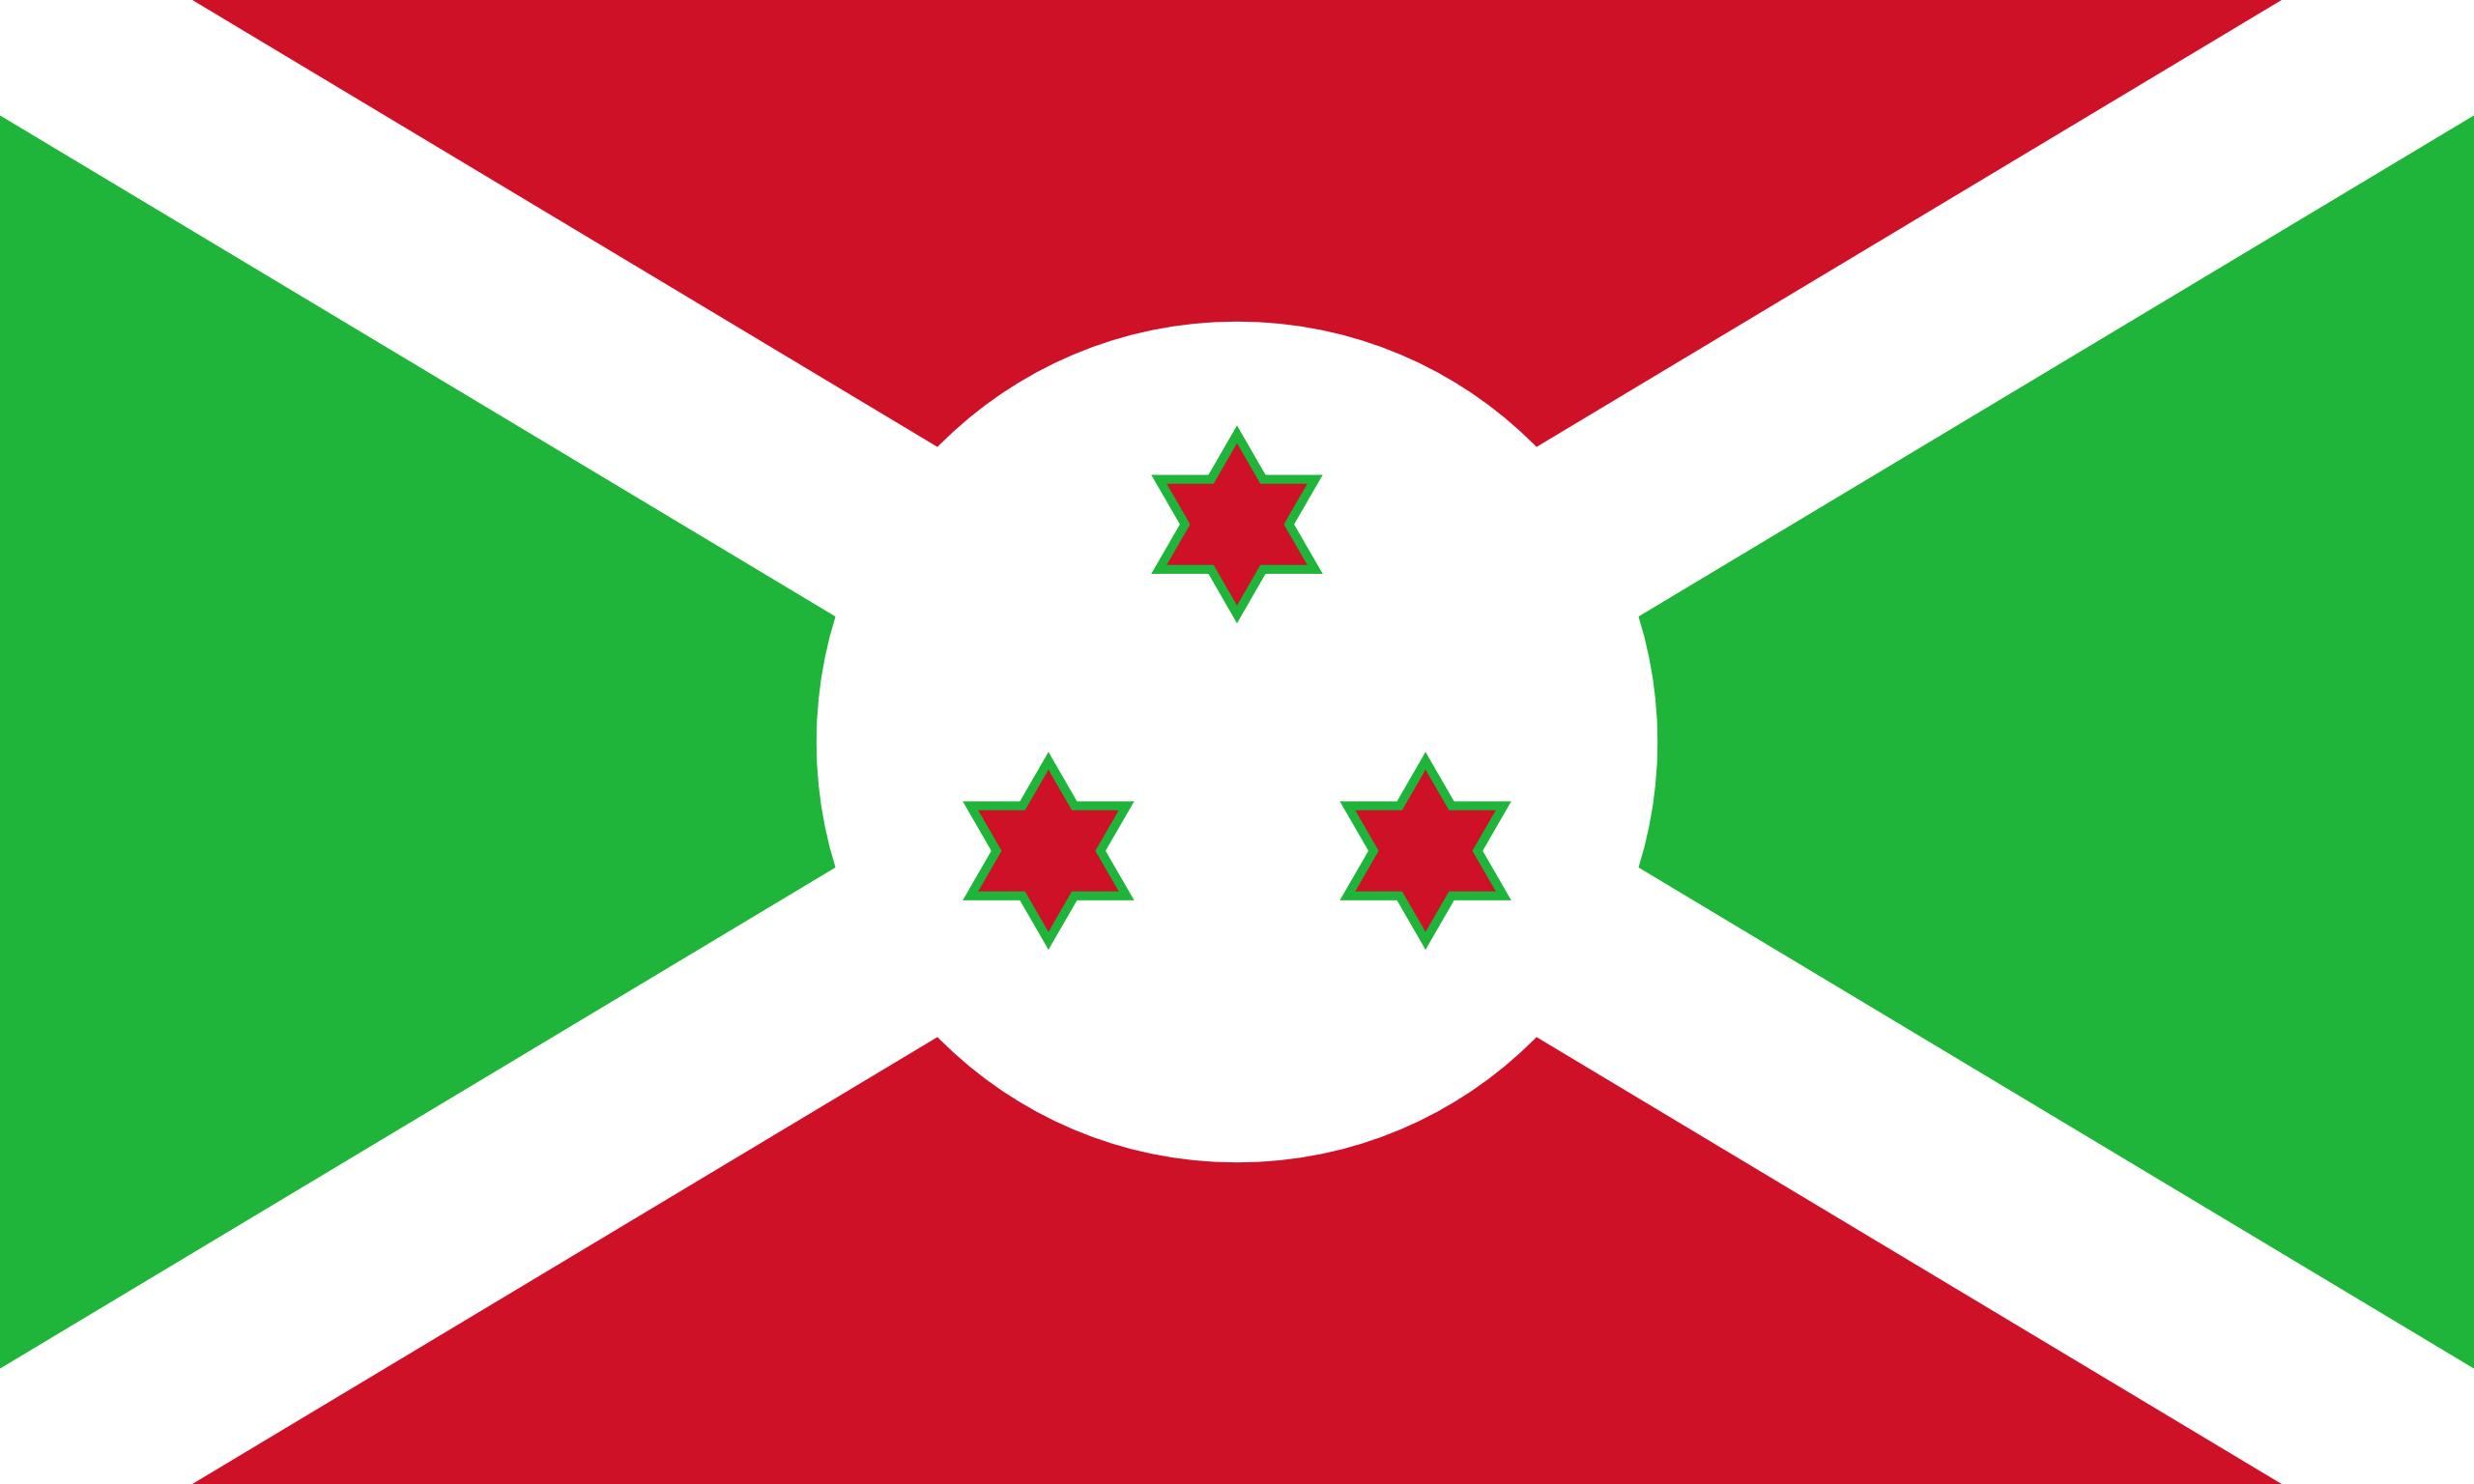 burundi, देश, emblema, लोग�प्रतीकbolo - HD वॉलपेपर - प्रोफेसर-falken.com